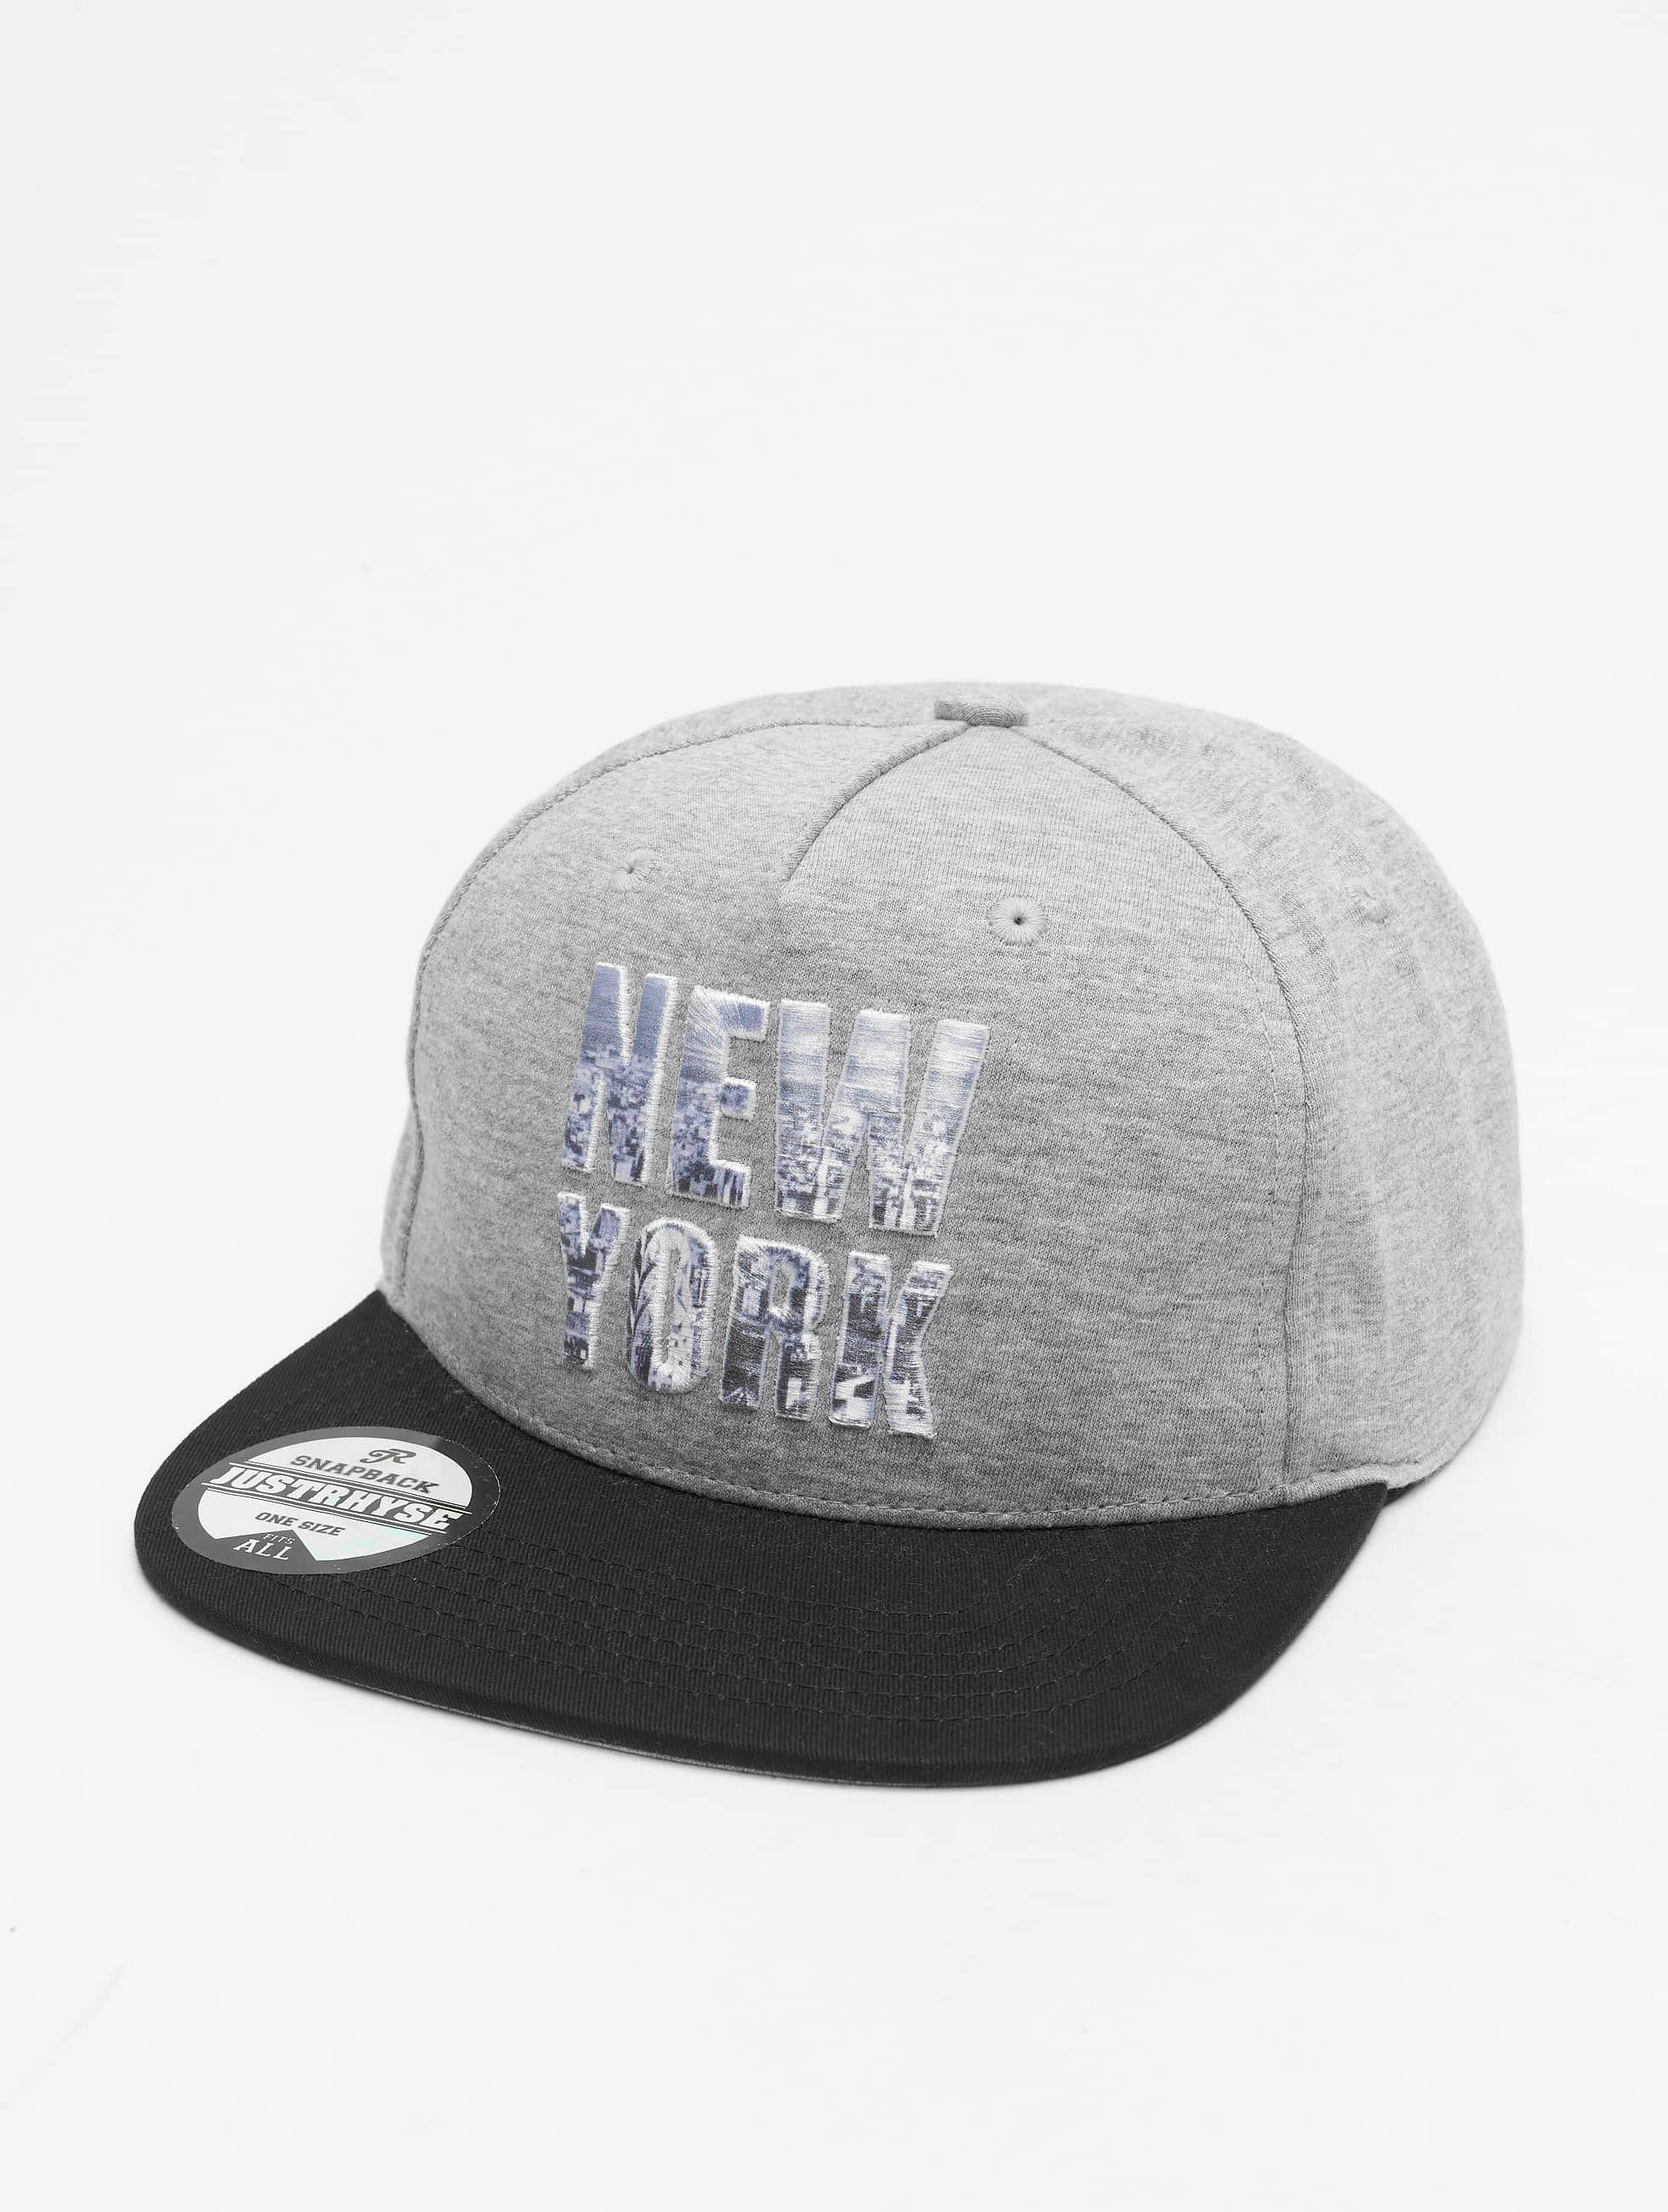 Just Rhyse / Snapback Cap New York Style in grey Adjustable